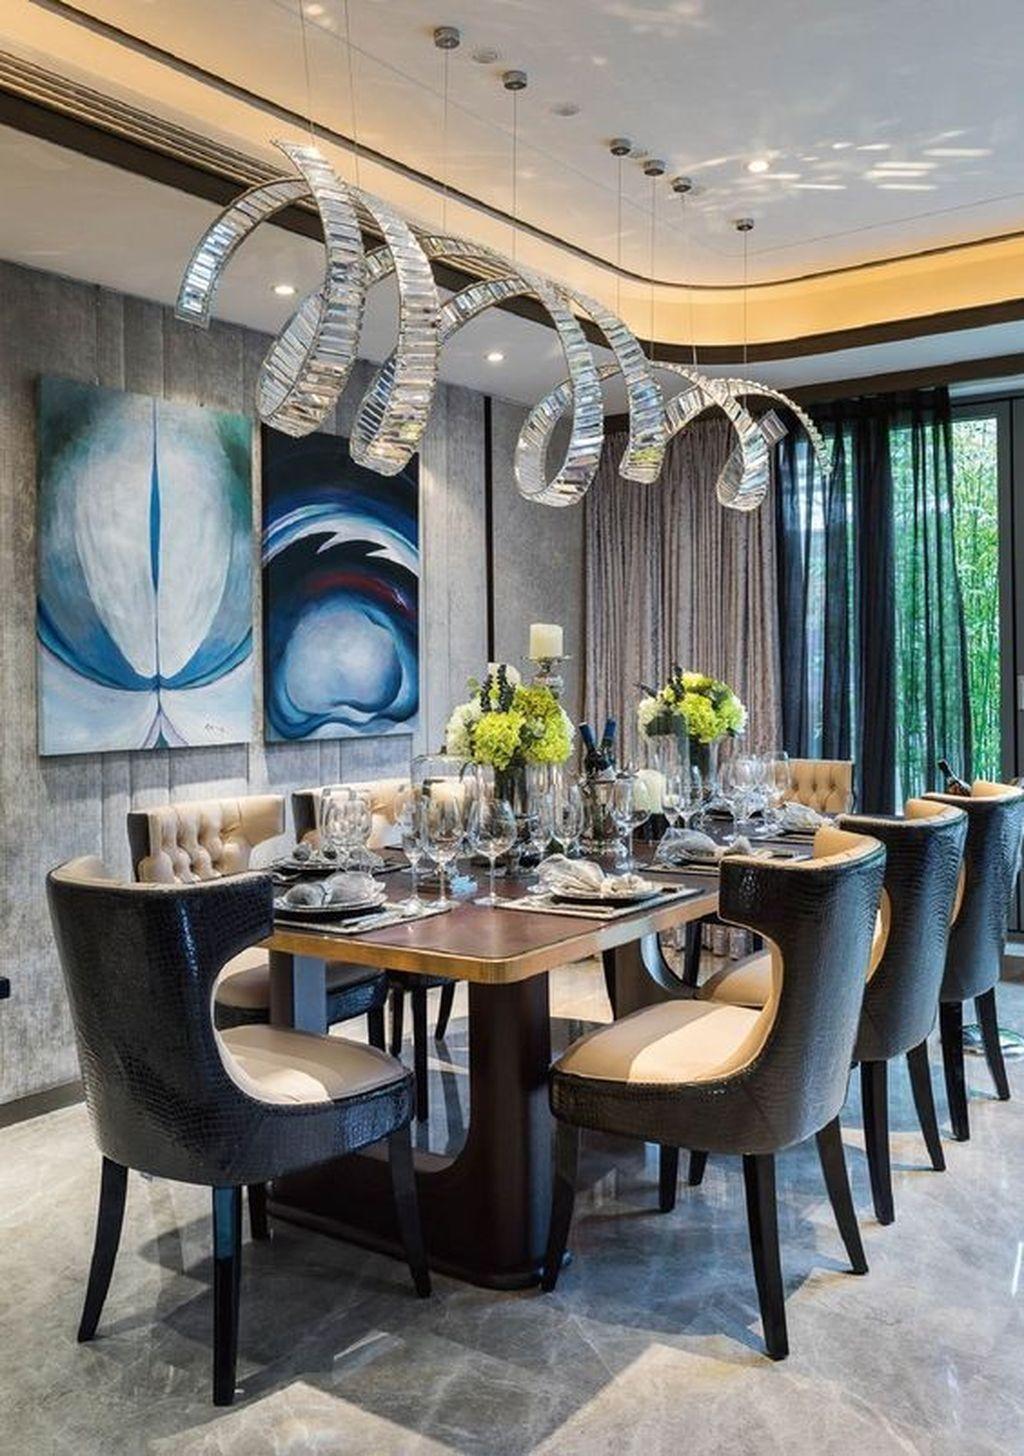 96 Inspiring Modern Dining Room Design Ideas Aladdinslamp Net Home Design Elegant Dining Room Luxury Dining Room Dining Room Design Modern